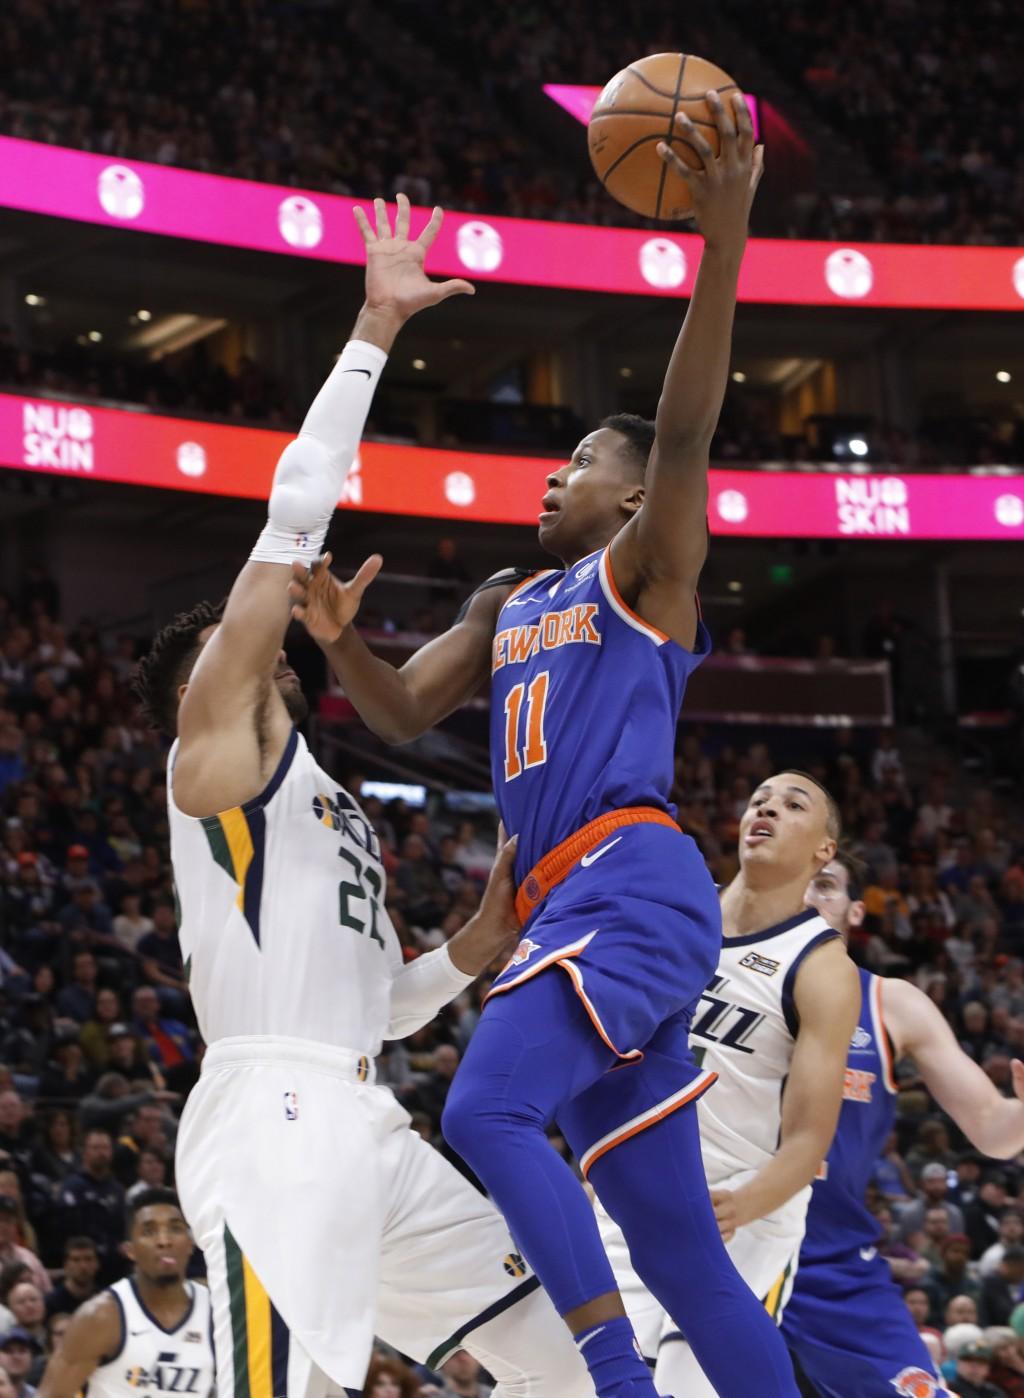 New York Knicks' Frank Ntilikina (11) attempts a layup as Utah Jazz's Thabo Sefolosha, left, defends in the first half of an NBA basketball game on Sa...